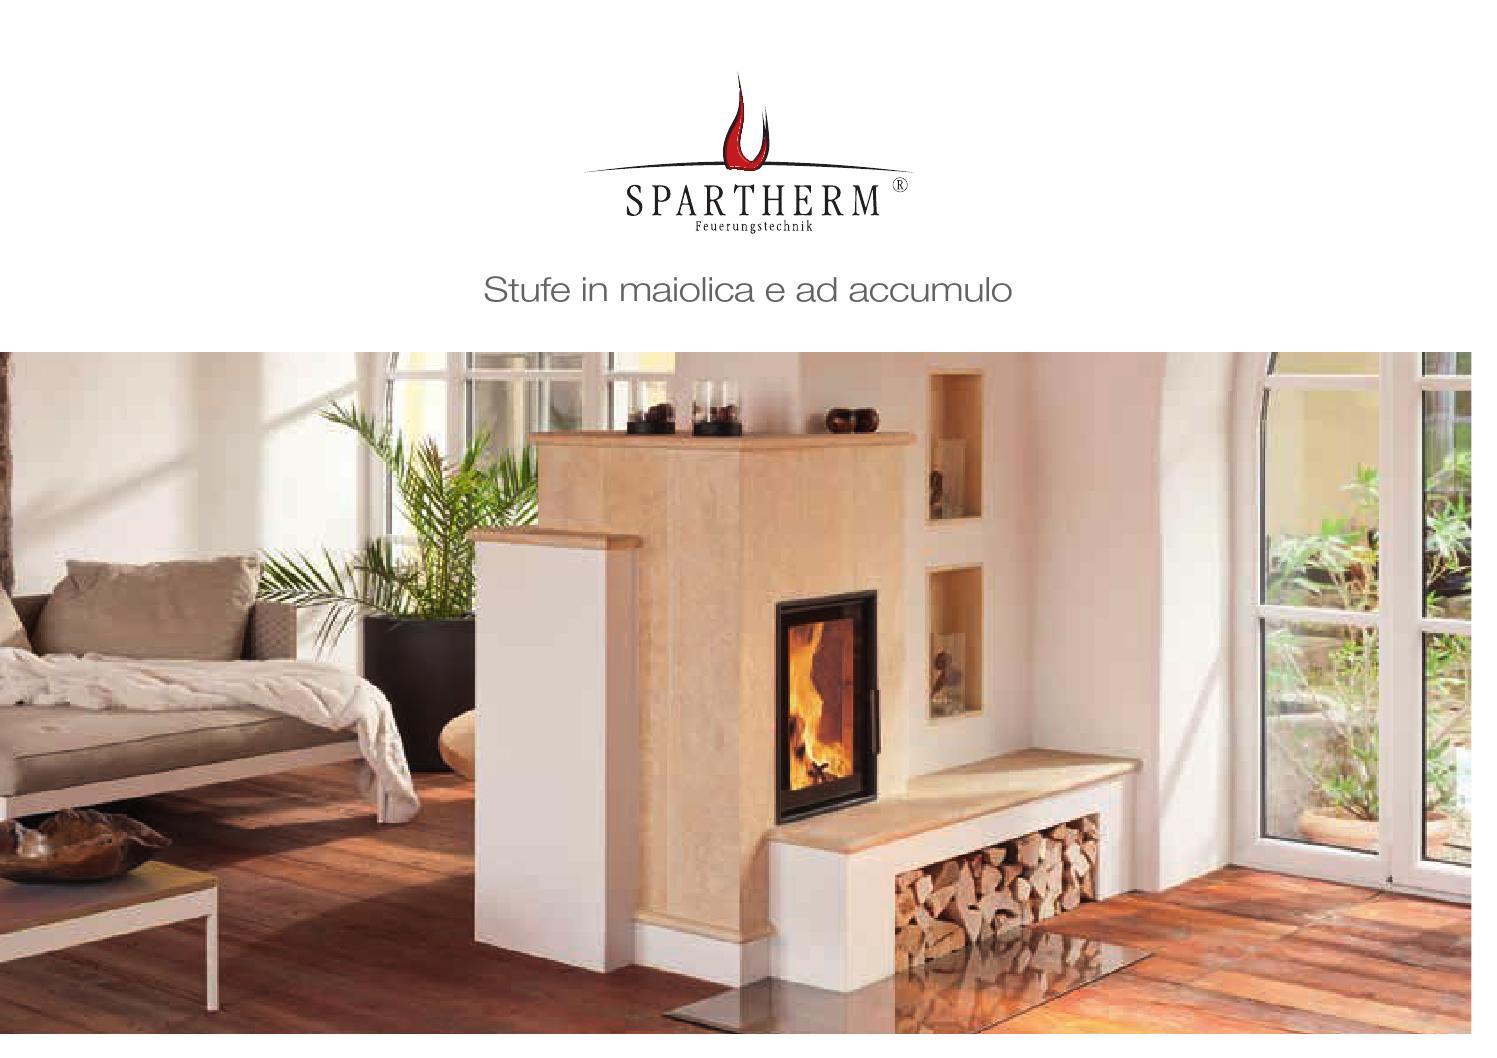 Spartherm stufe ad accumulo by idea studio caminetti issuu